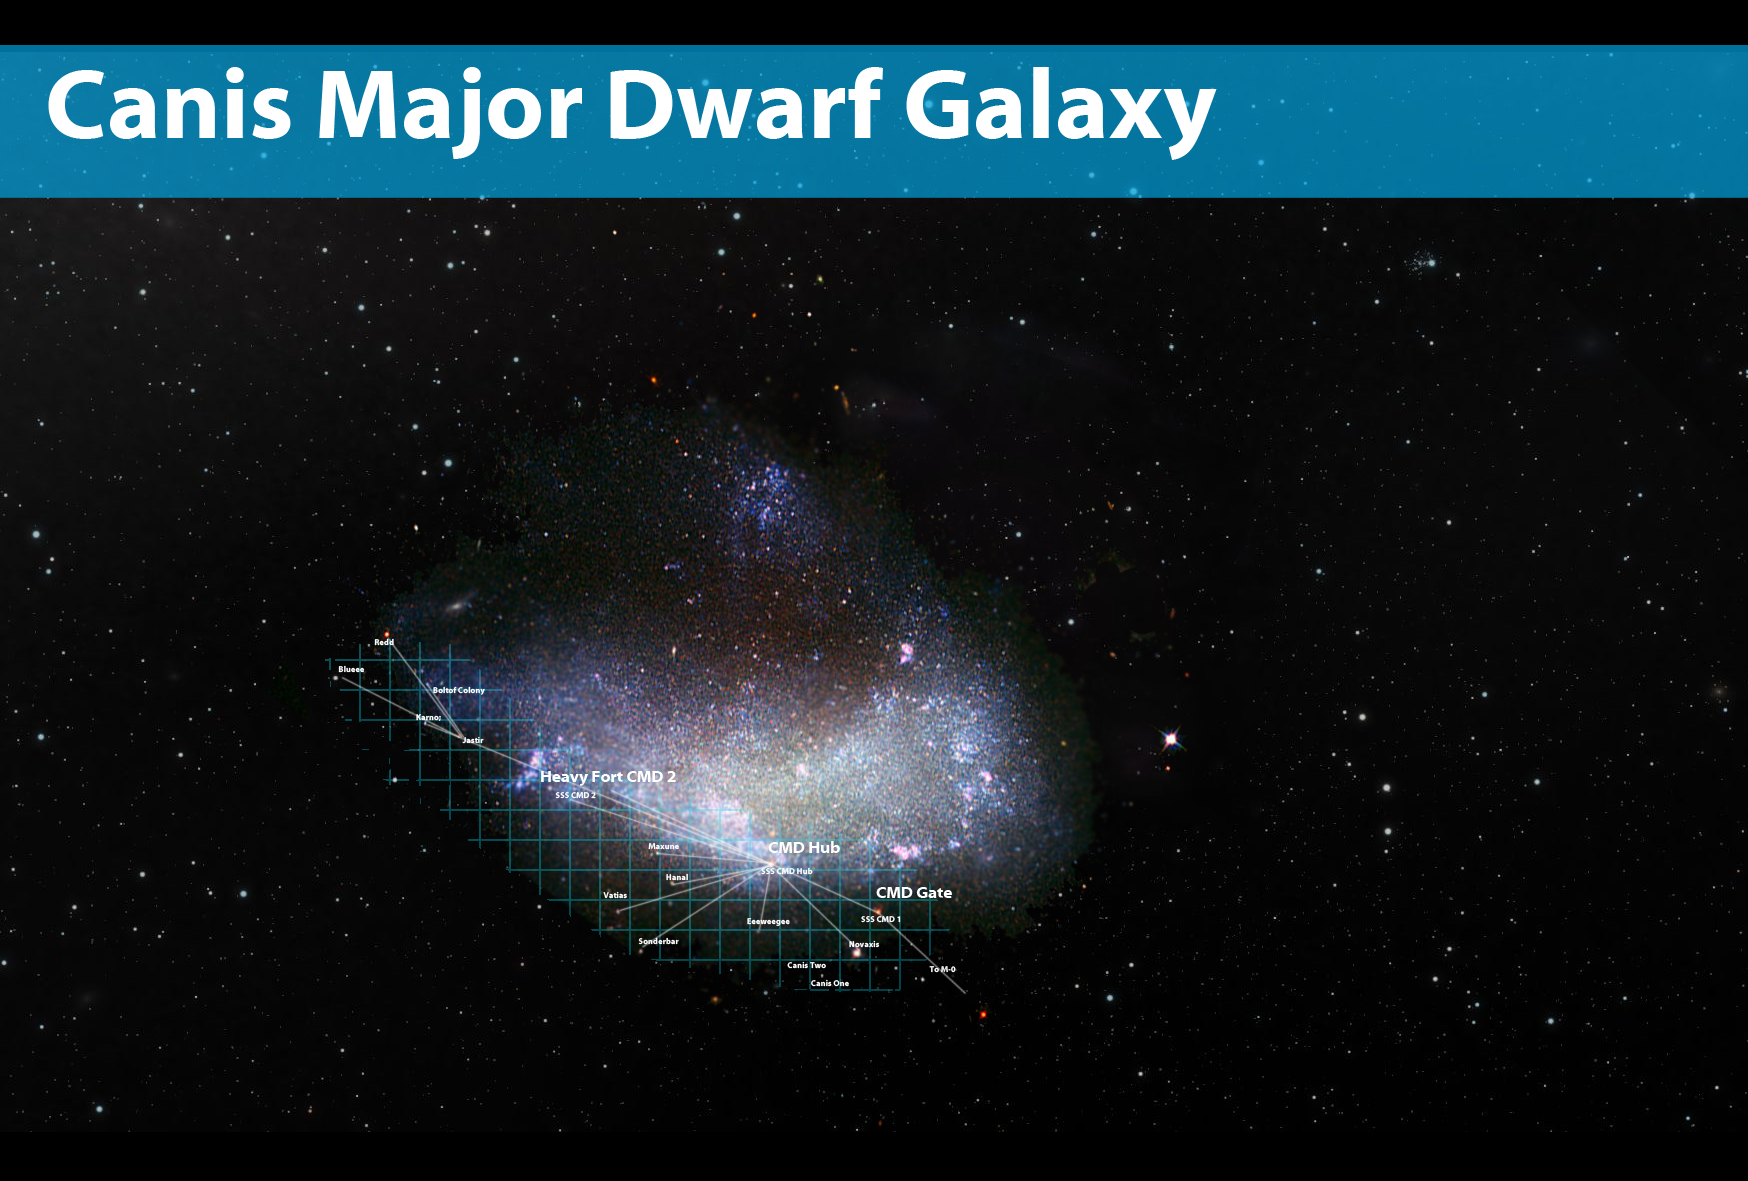 canis major dwarf galaxy - photo #11